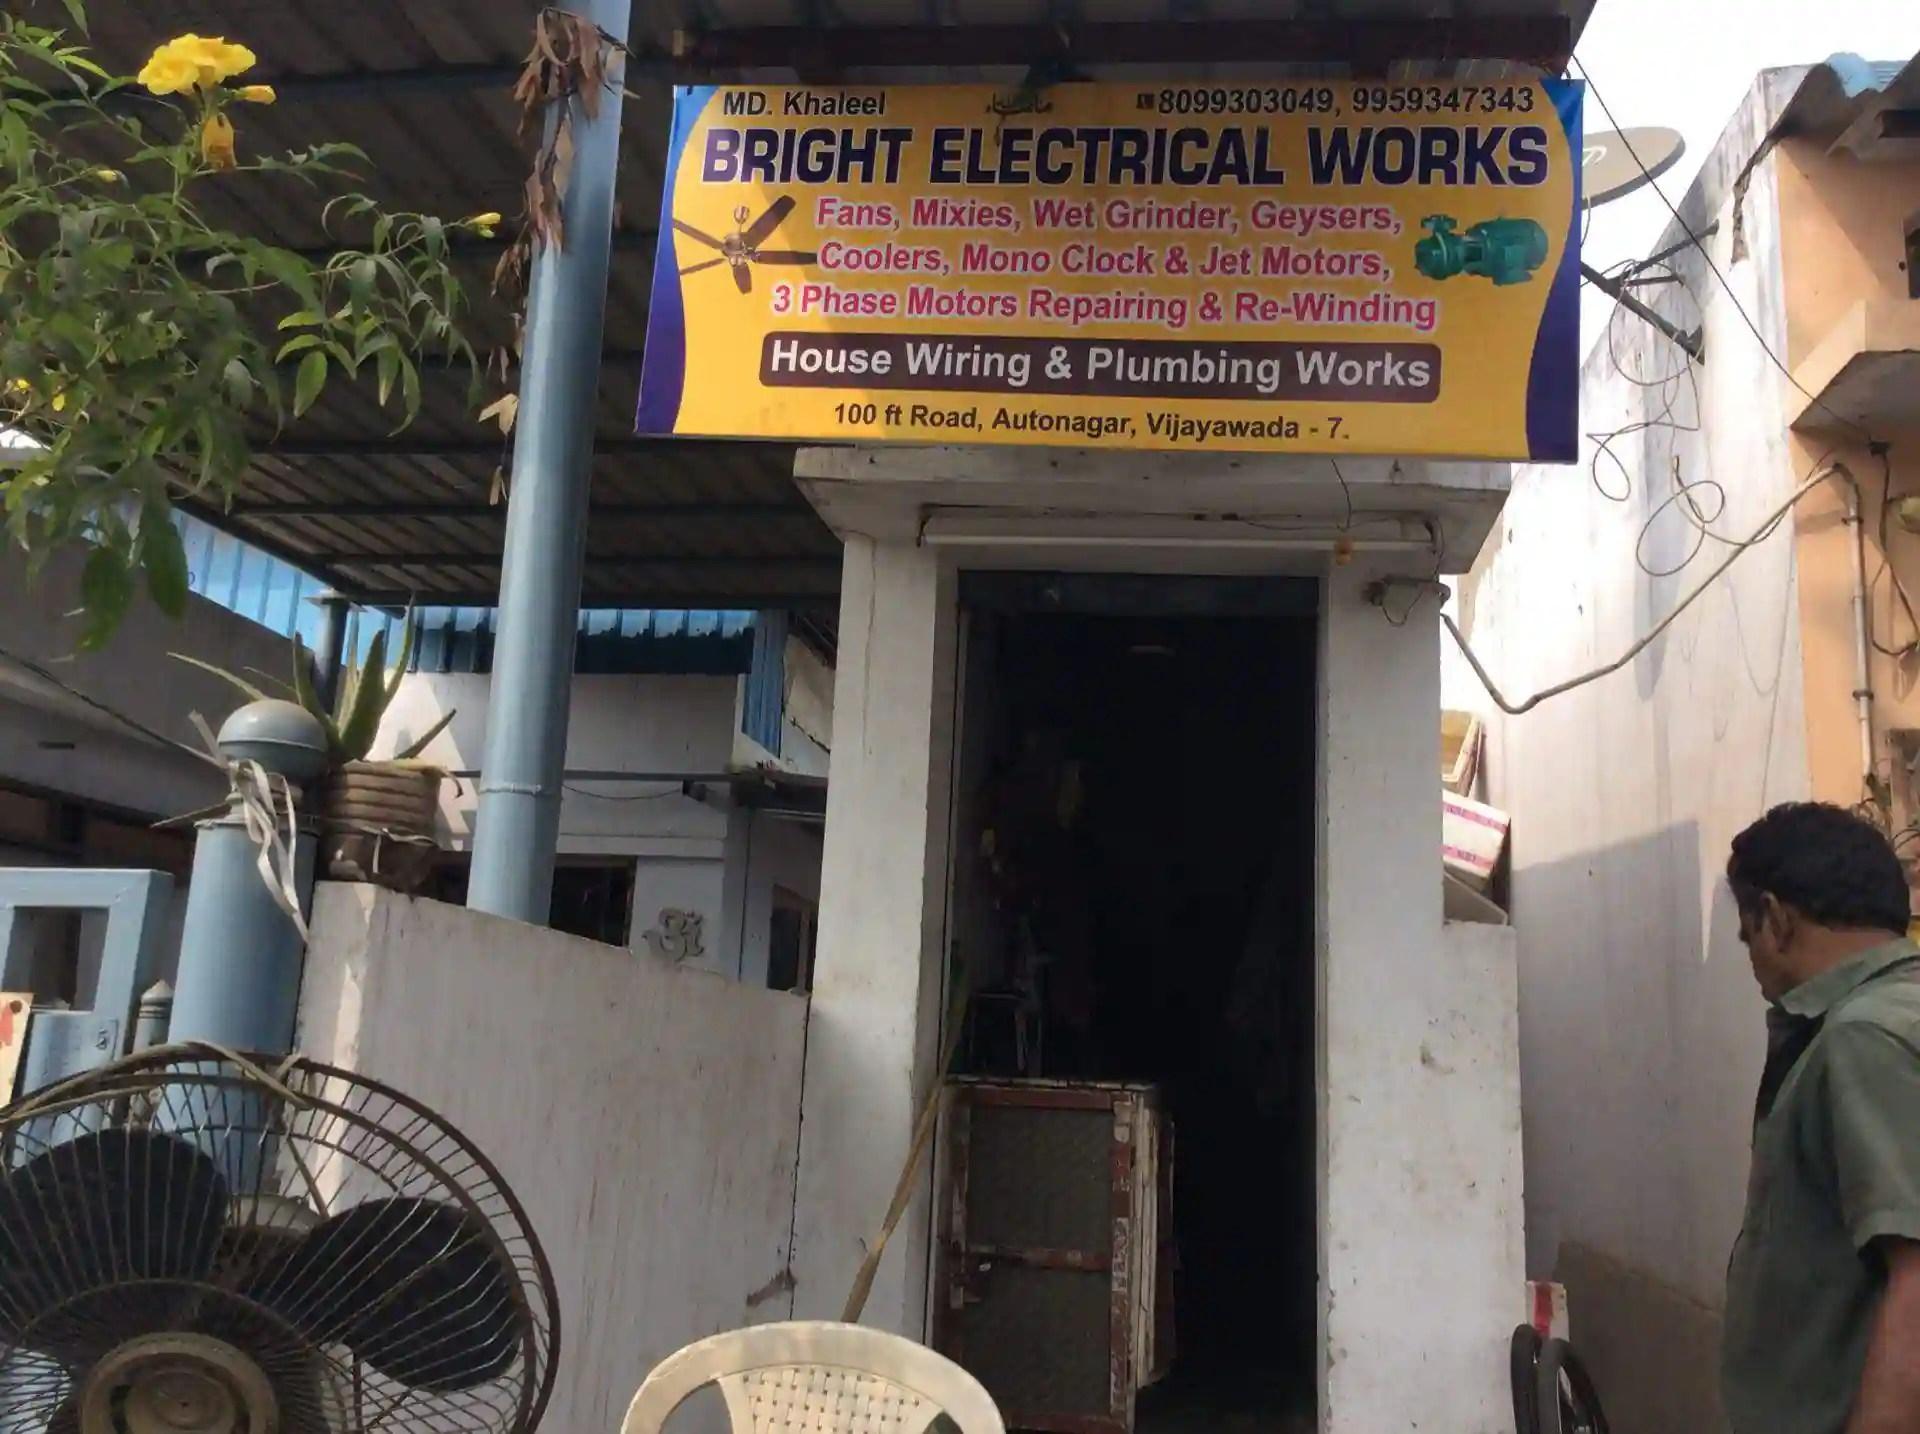 hight resolution of  bright electrical works photos auto nagar vijayawada electricians